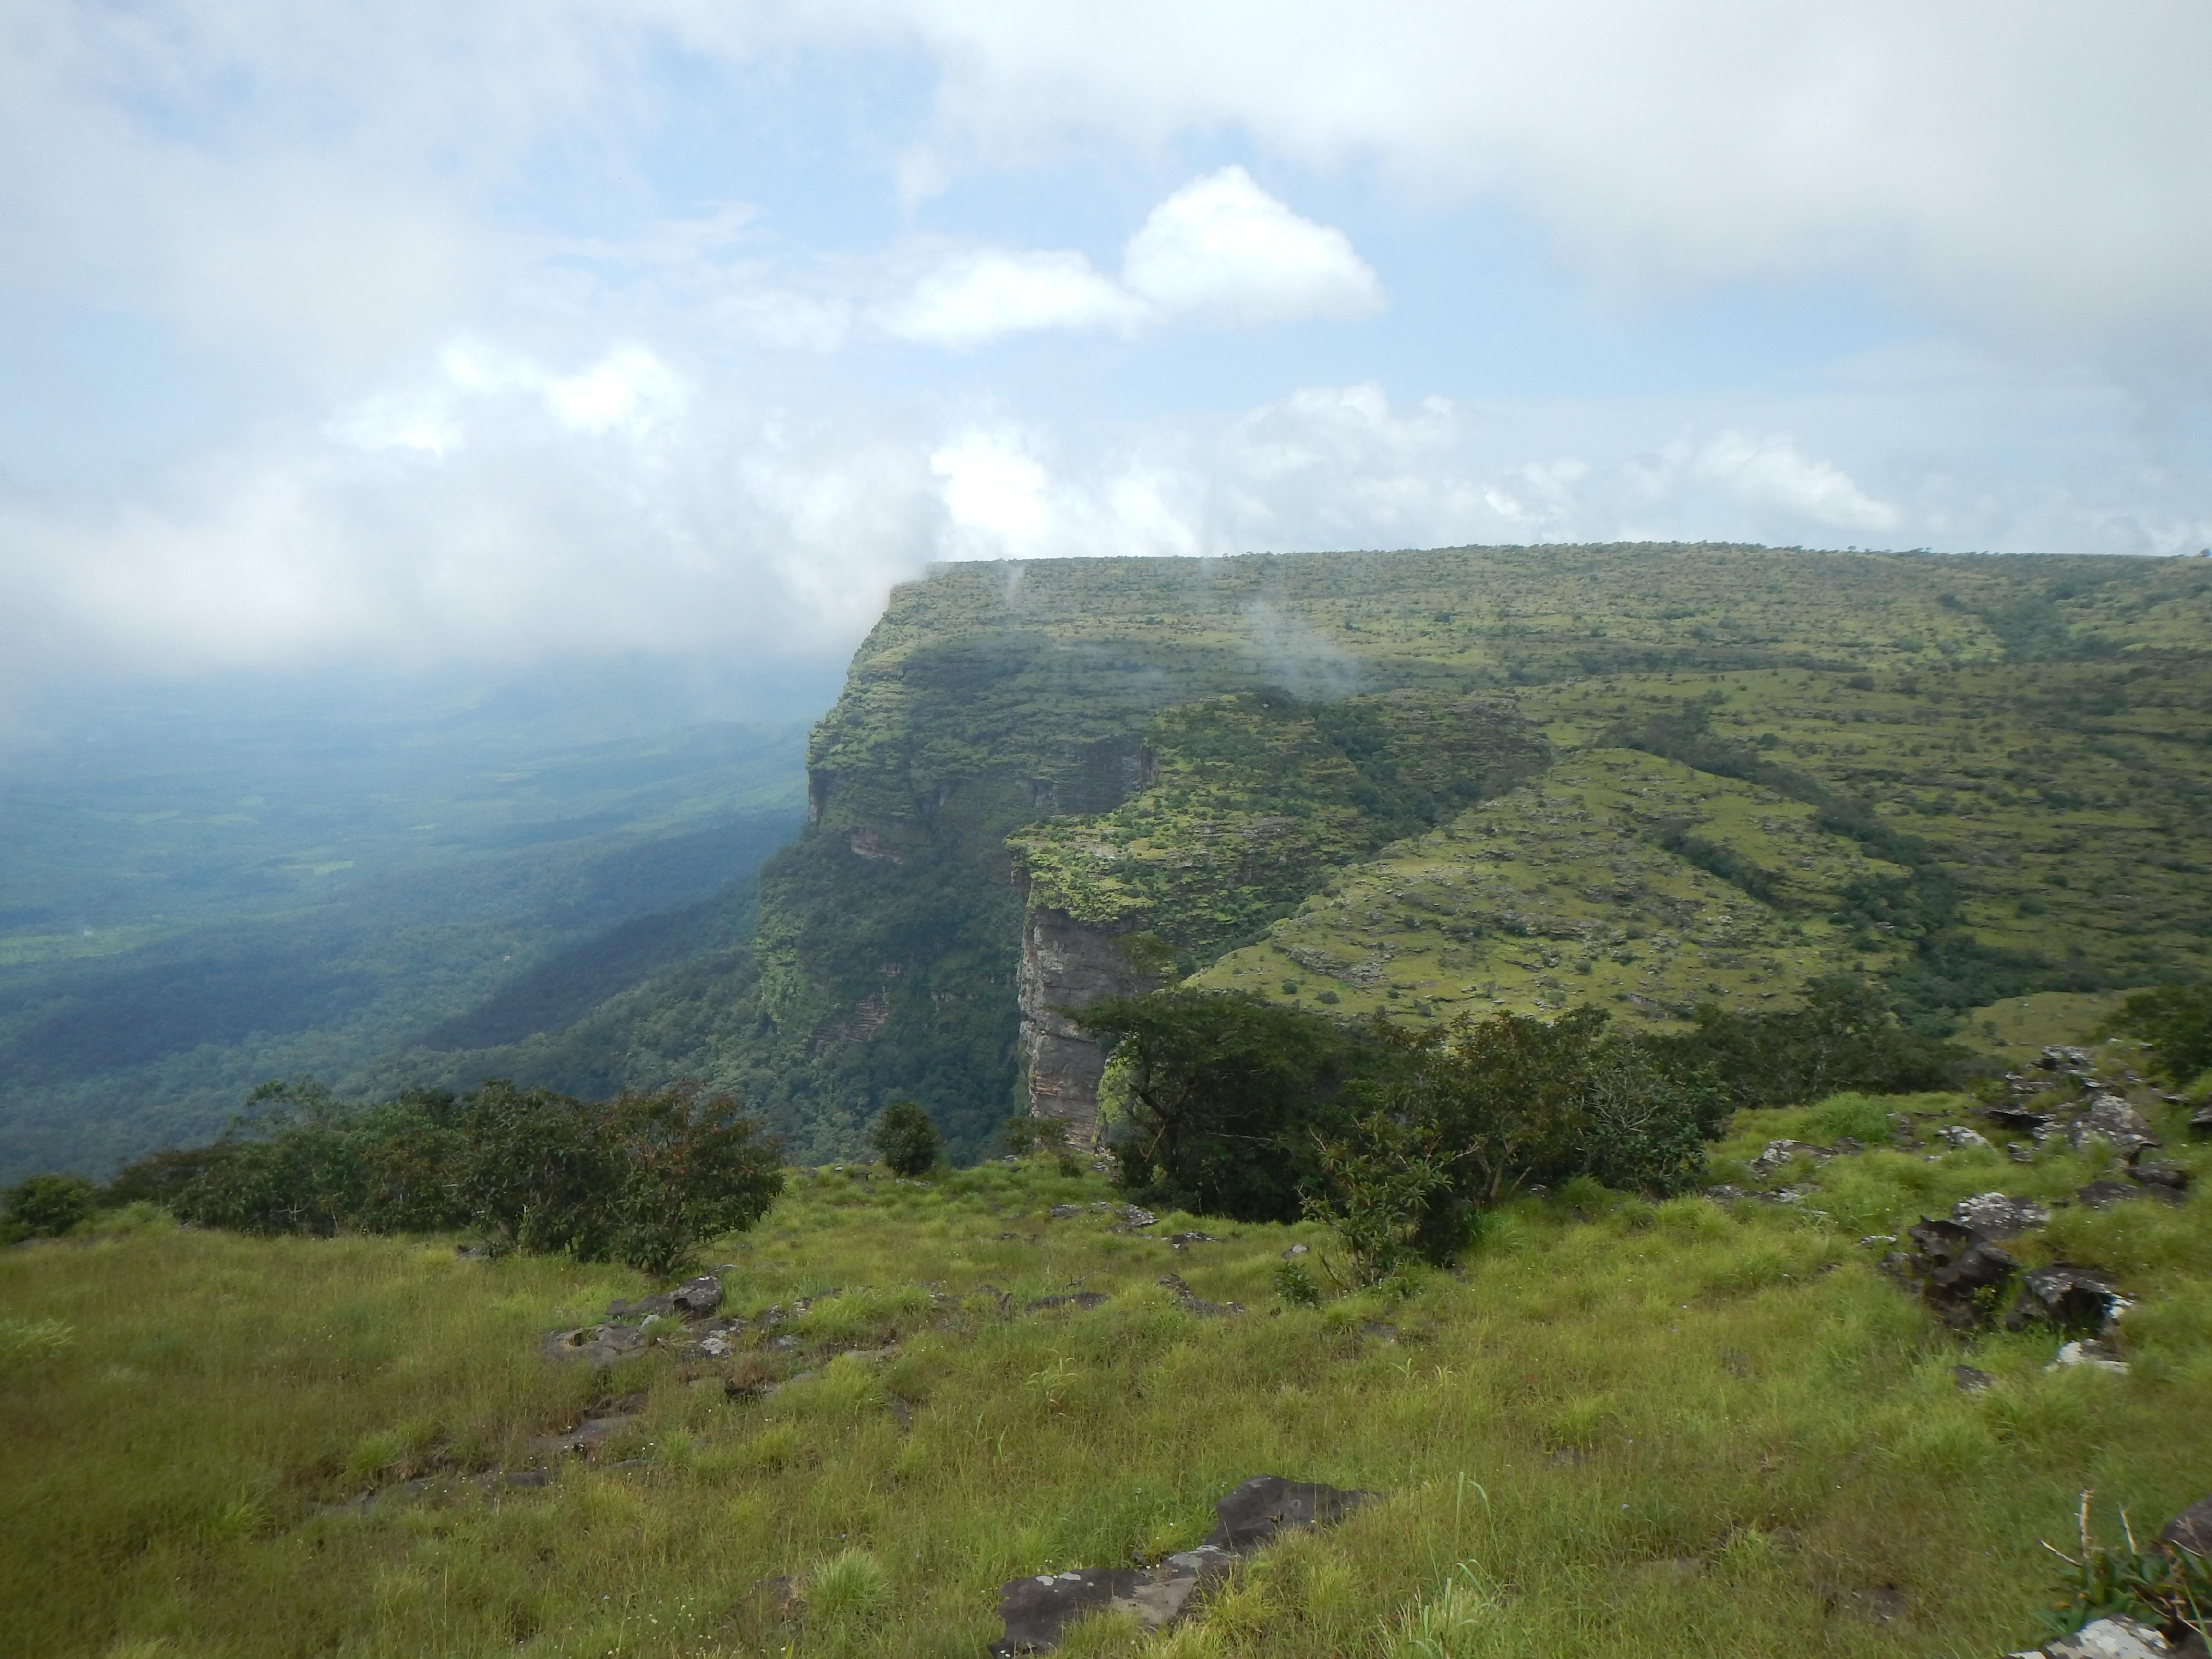 Kounounkan Massif Plateau. (Photo: © Xander van der Burgt, RBG Kew)